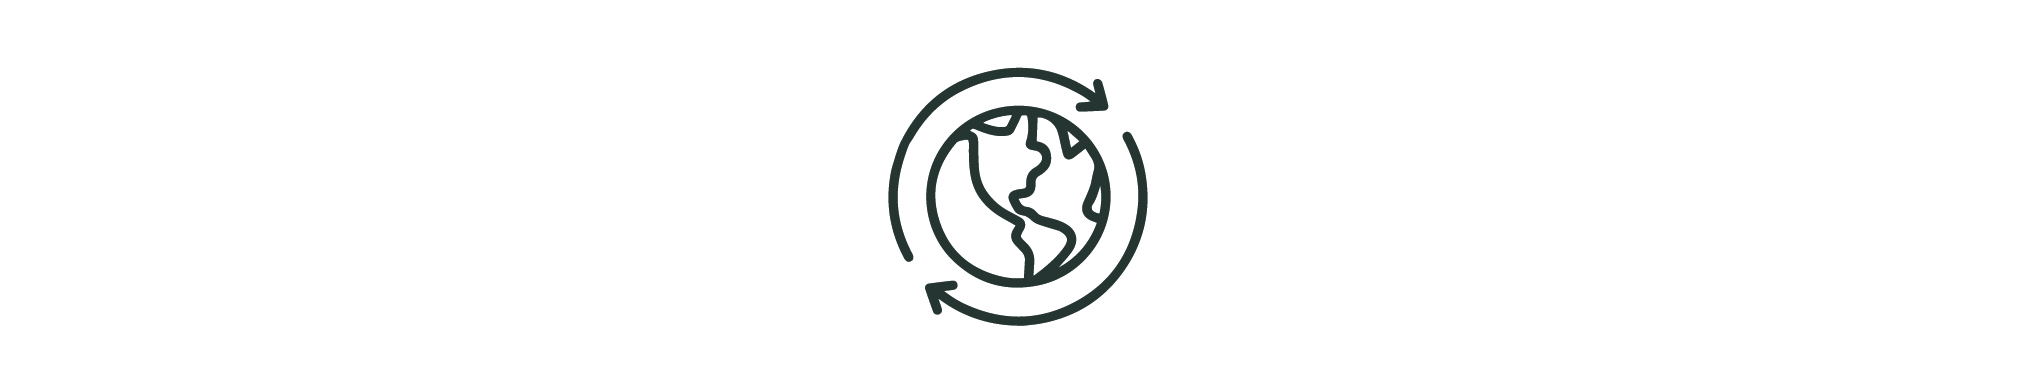 sustainable logo-01.jpg